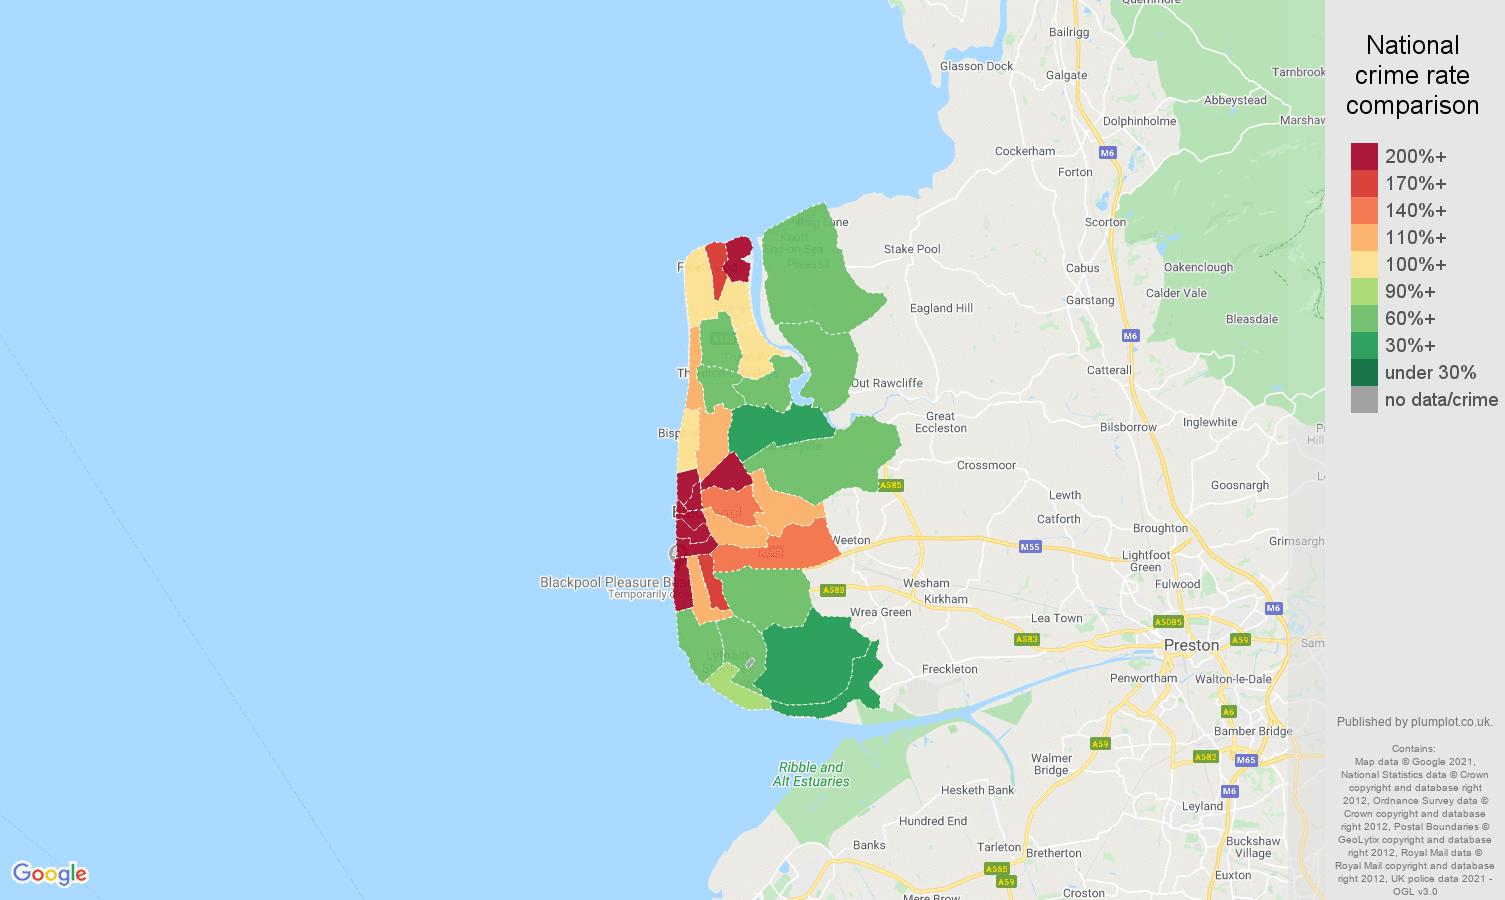 Blackpool violent crime rate comparison map